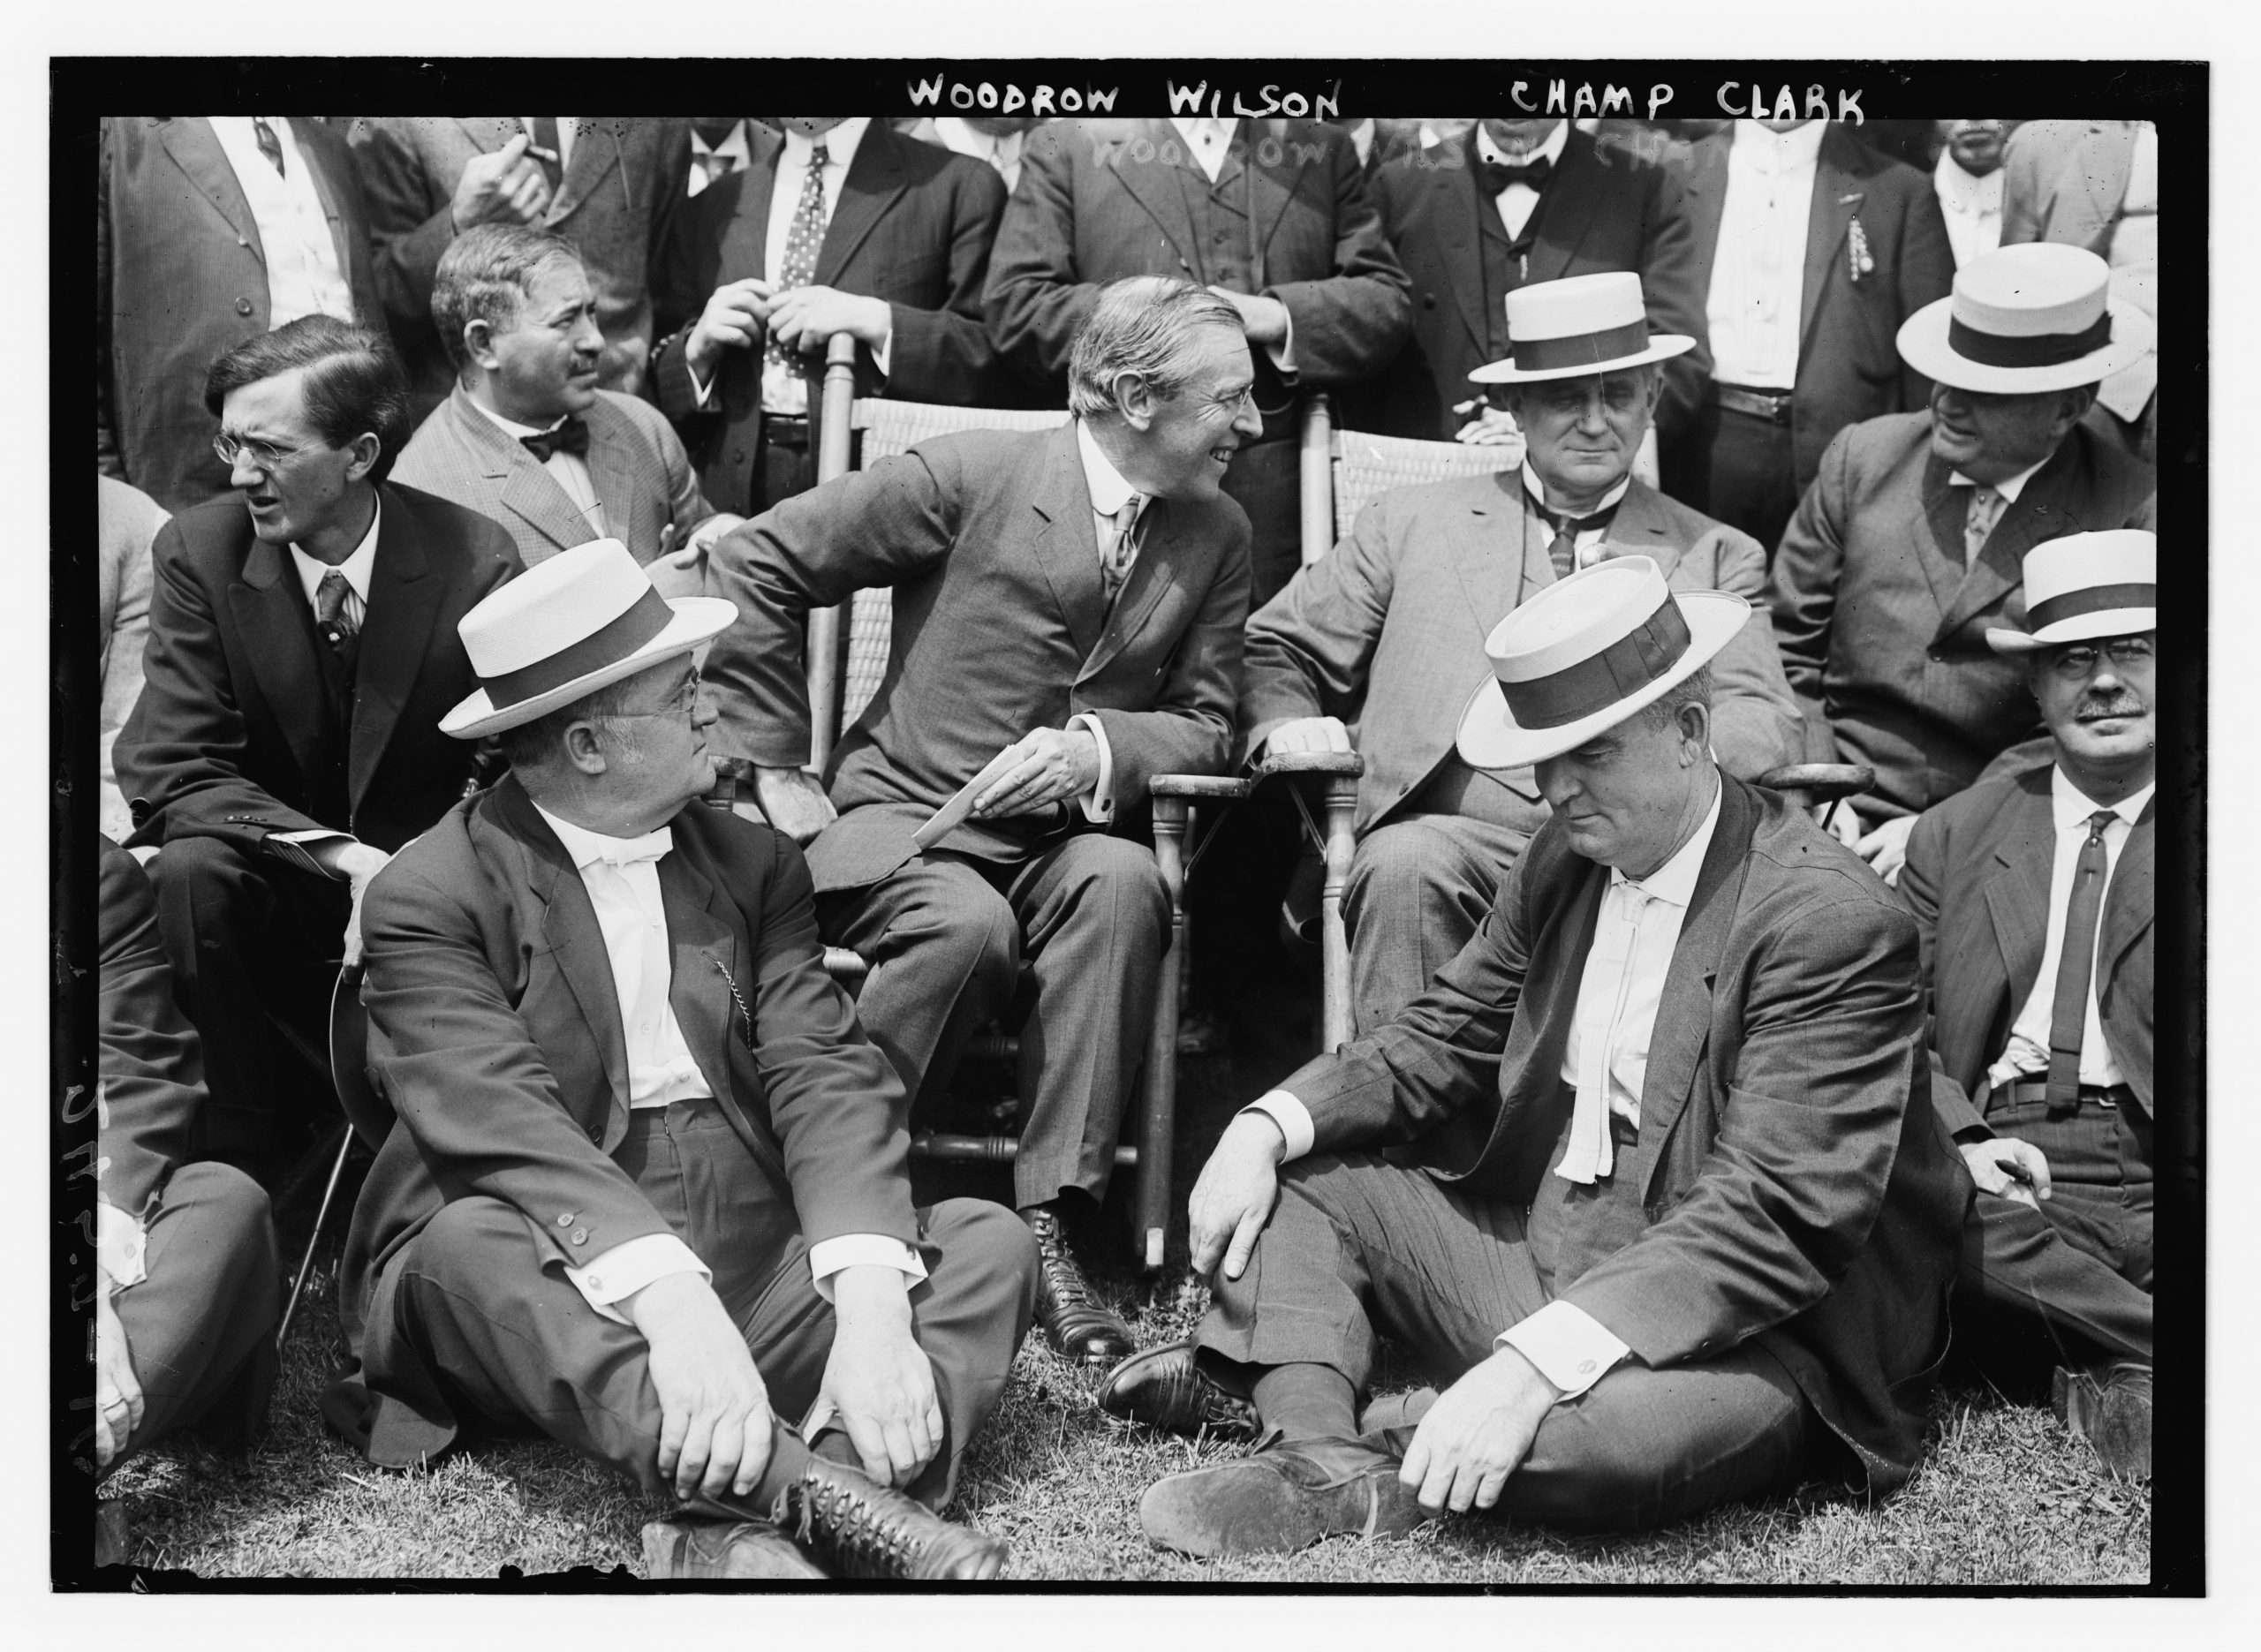 Democratic Presidential Nominee Woodrow Wilson